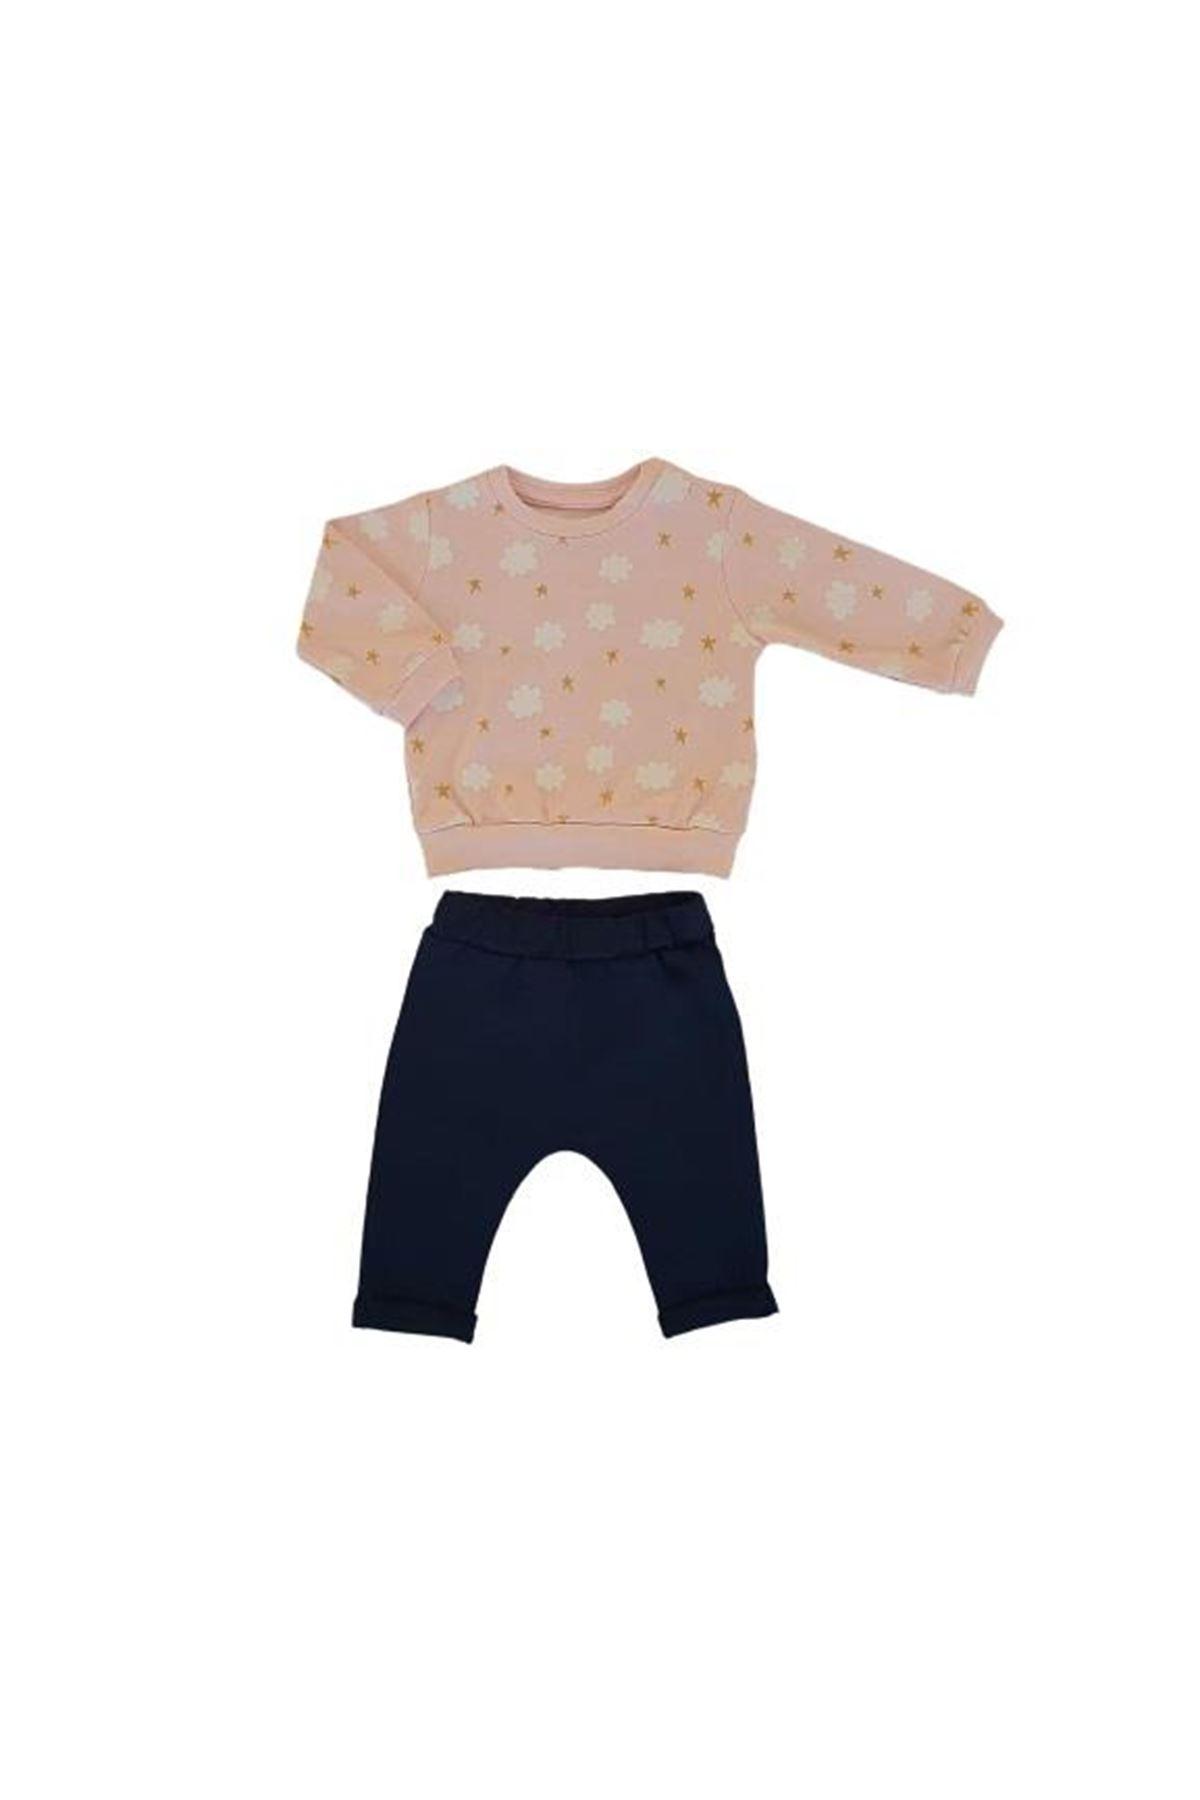 Tongs Baby Bulutlu 2li Bebe Takım 3516 Pembe